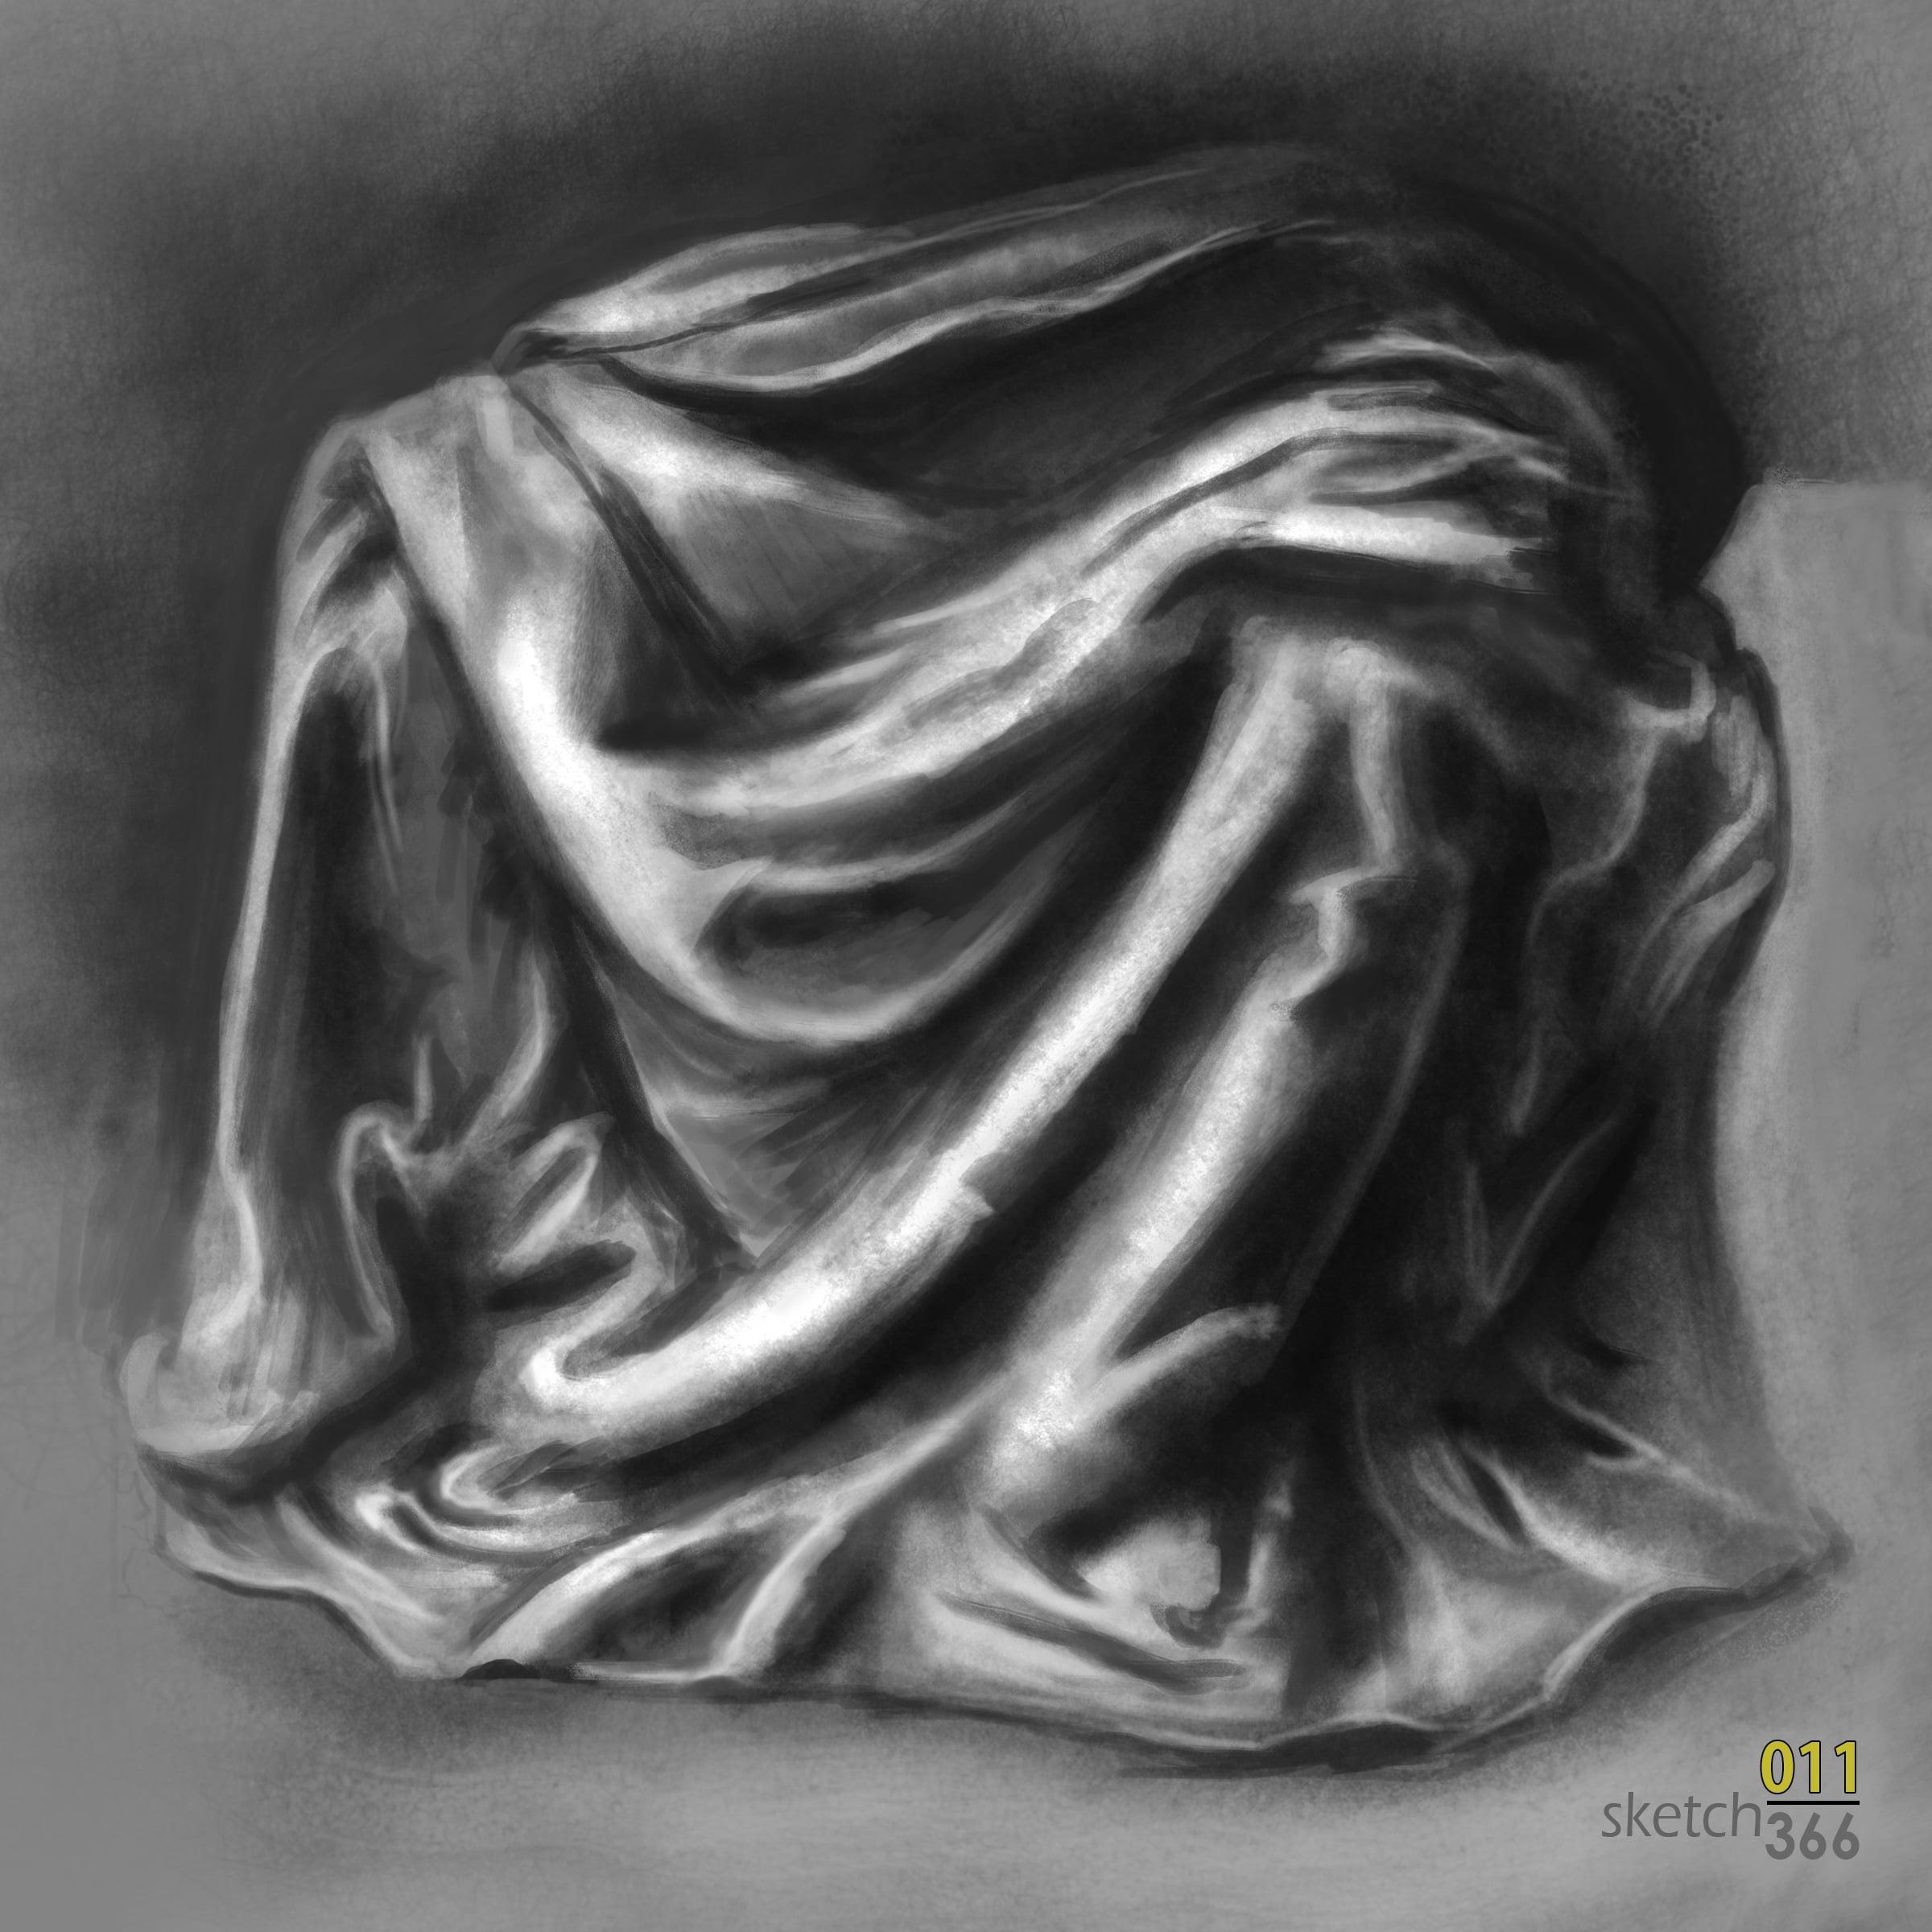 DaVinci garmet study - master study - digital paint